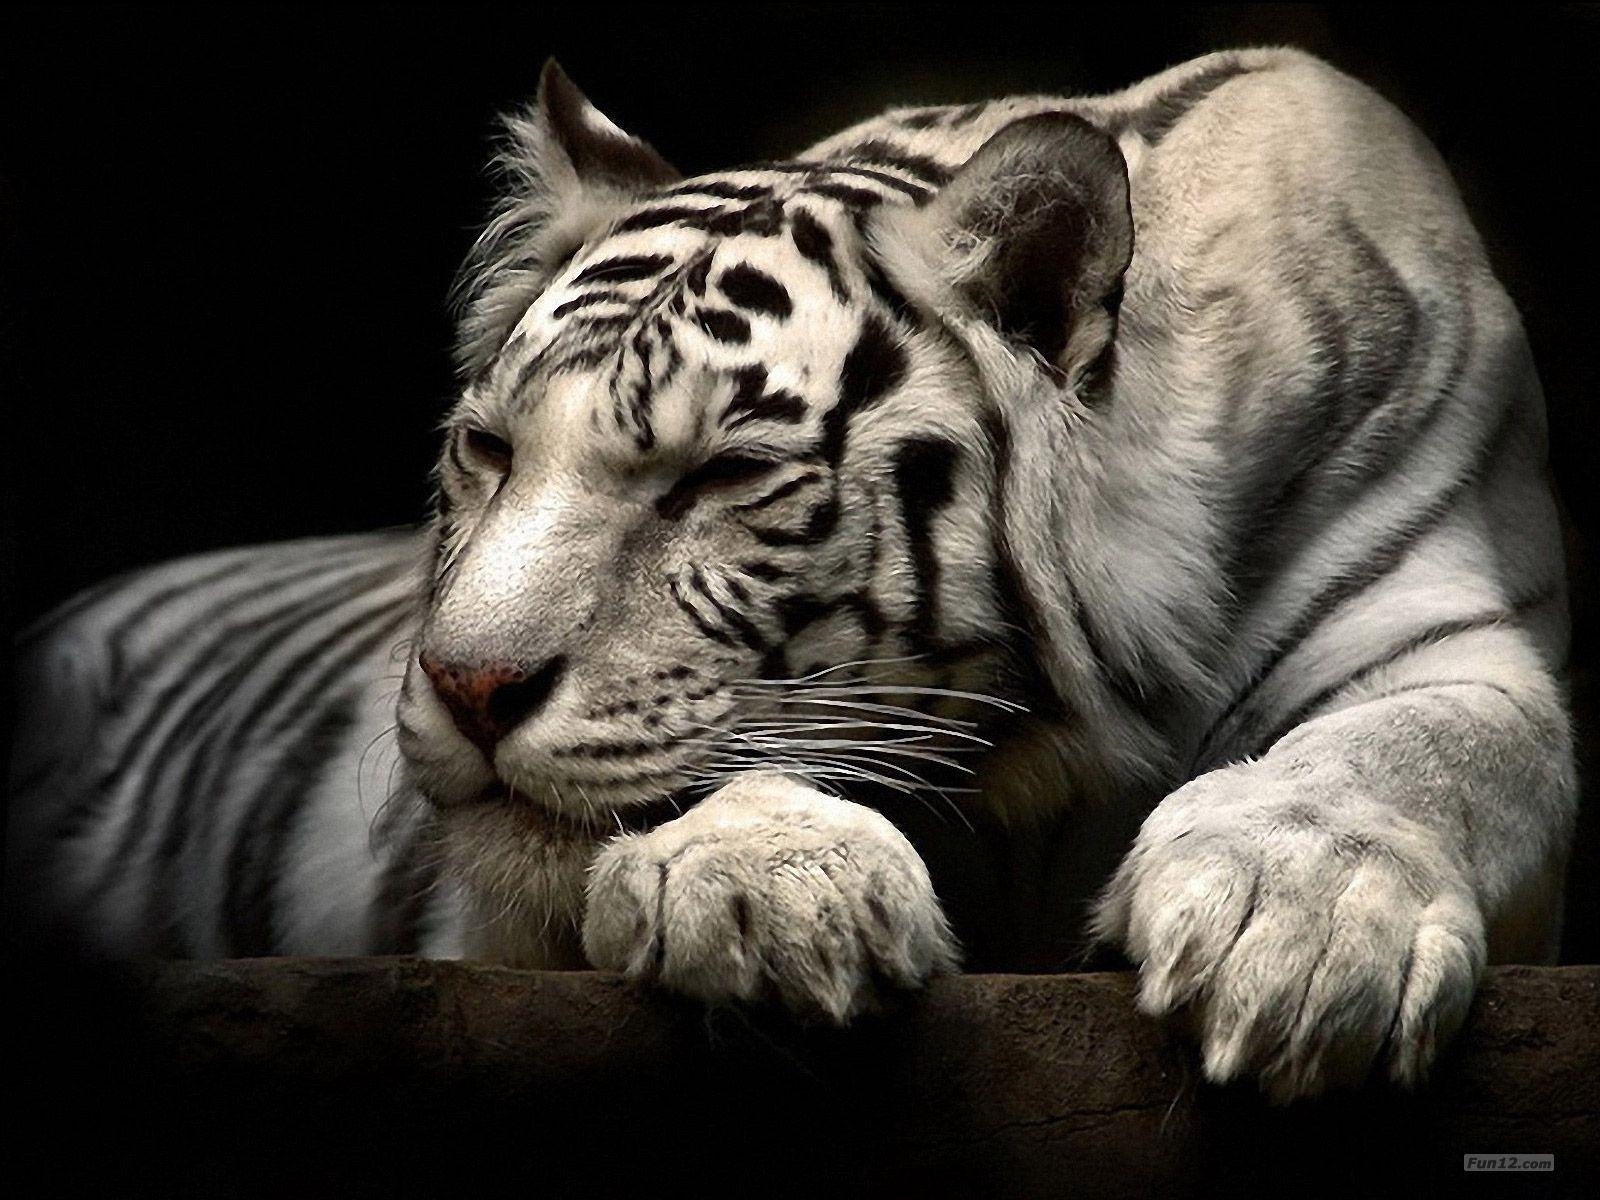 Best Wallpapers White Tiger Sleeping White Tiger Pet Mice Tiger